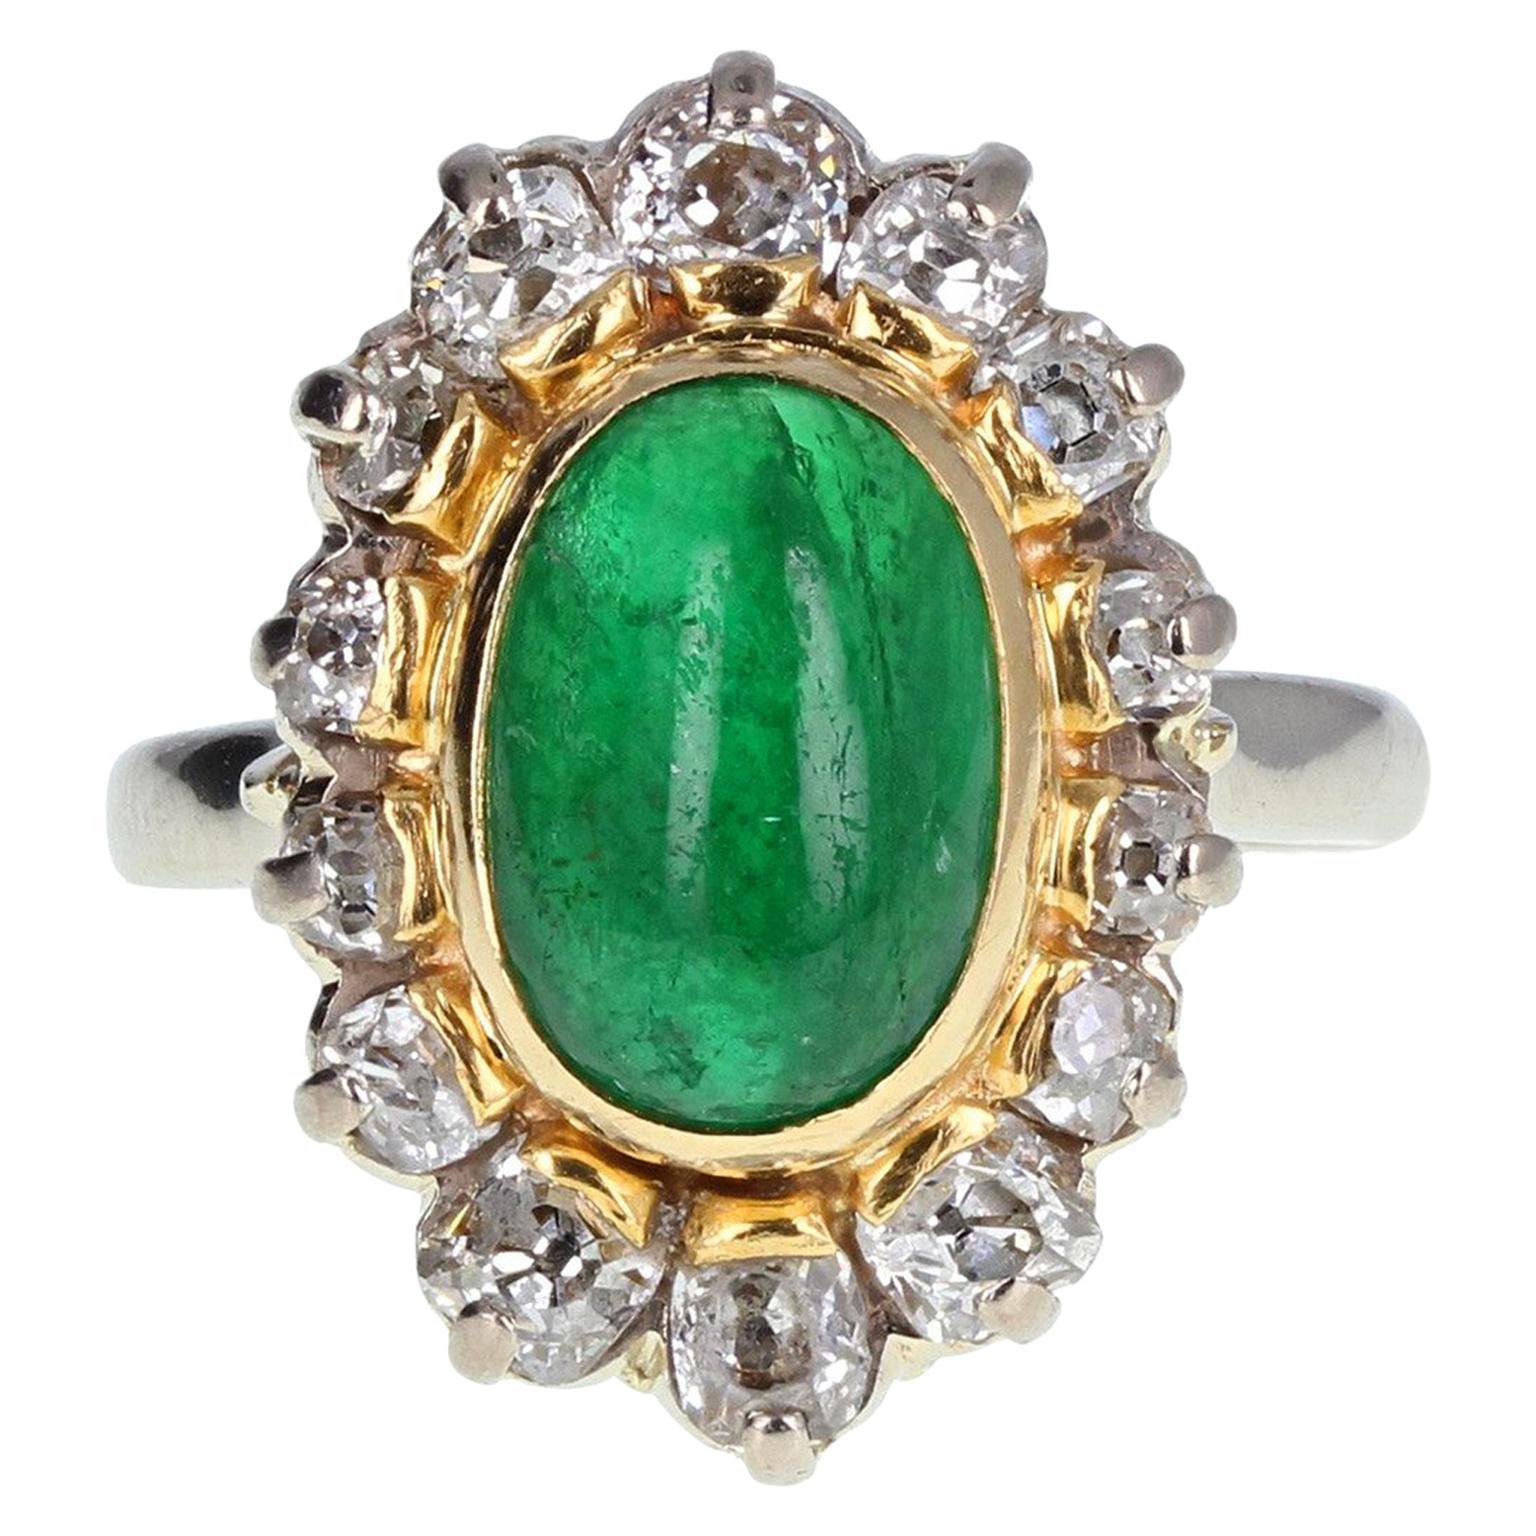 1950s Cabochon Emerald Diamond Cluster Ring